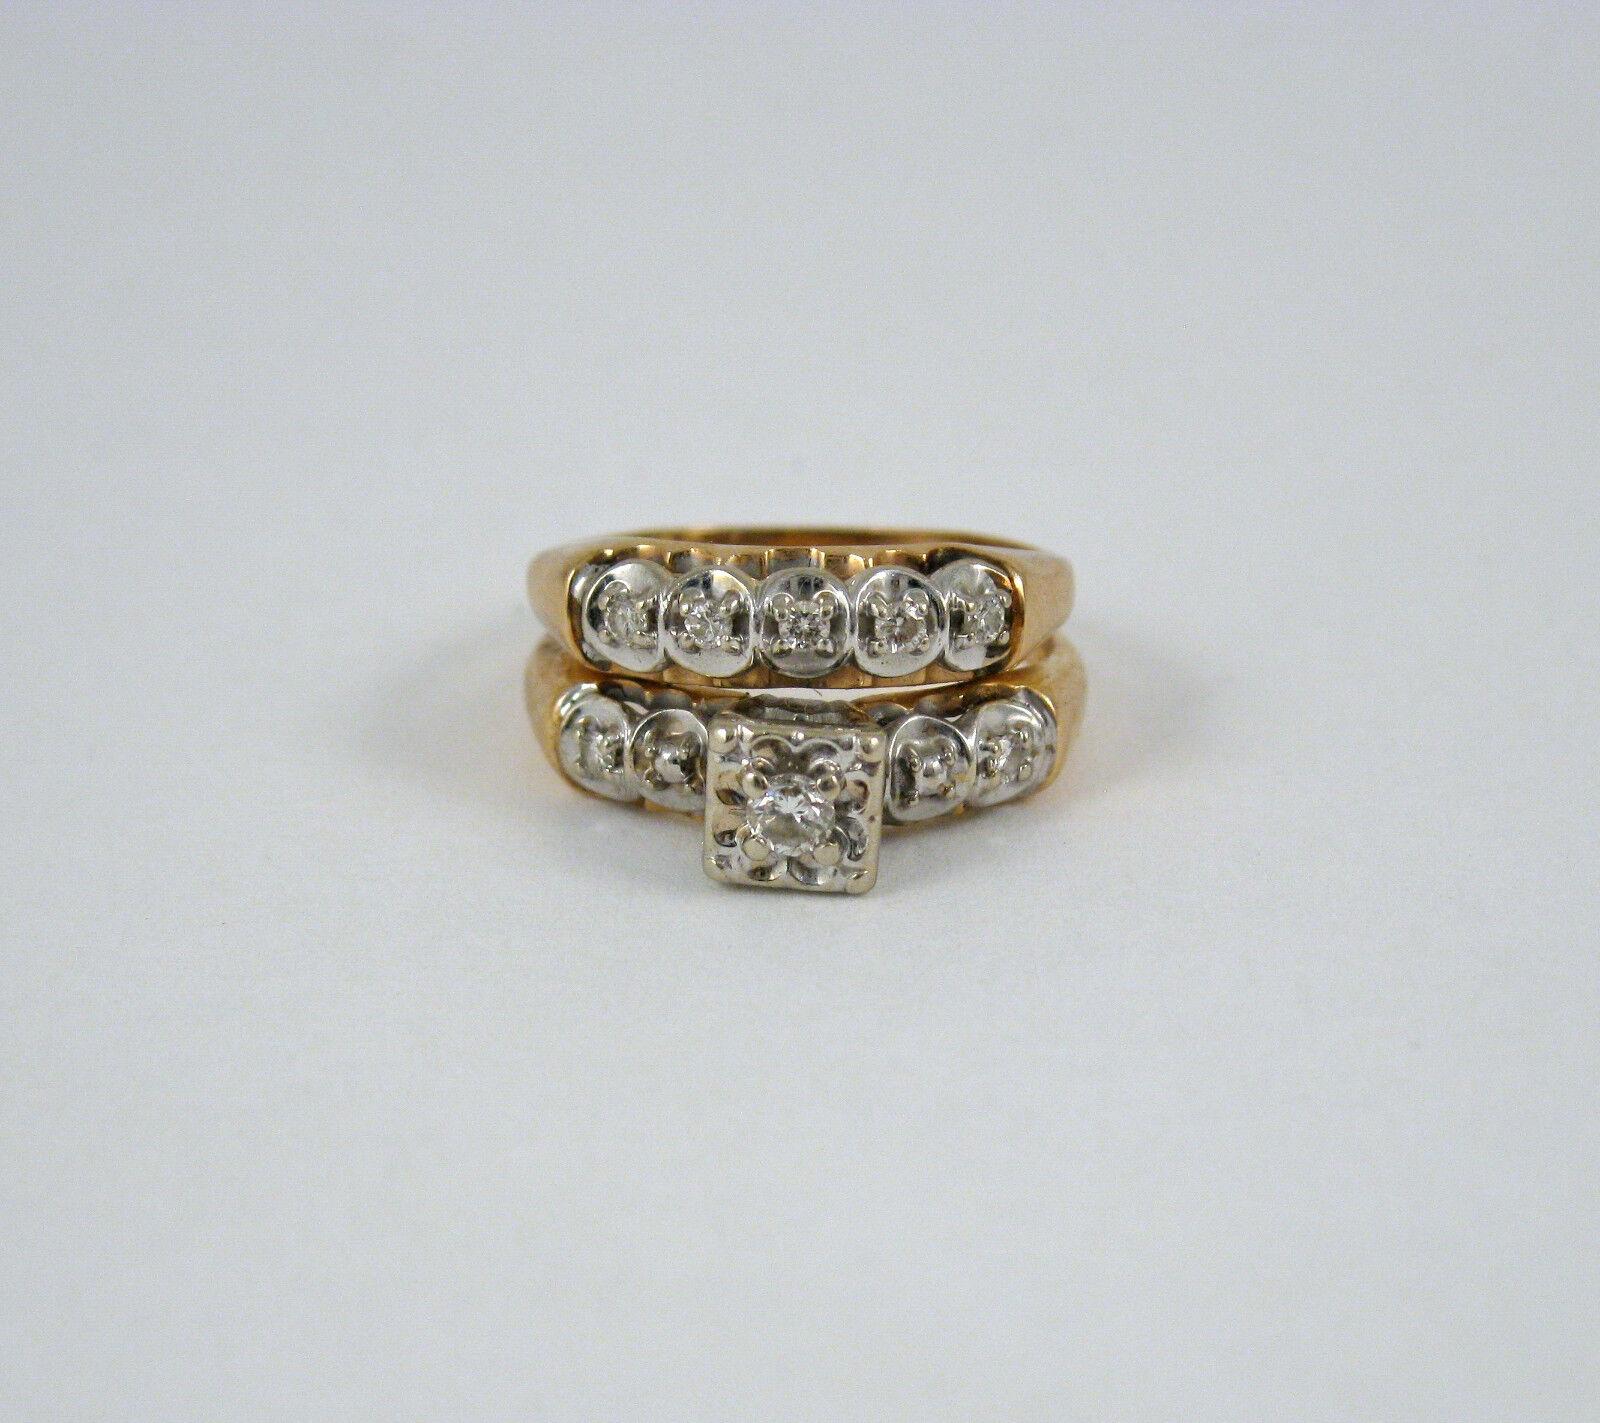 Antique 14k gold .25CTW Diamond Engagement Wedding Ring Set Size 6.5